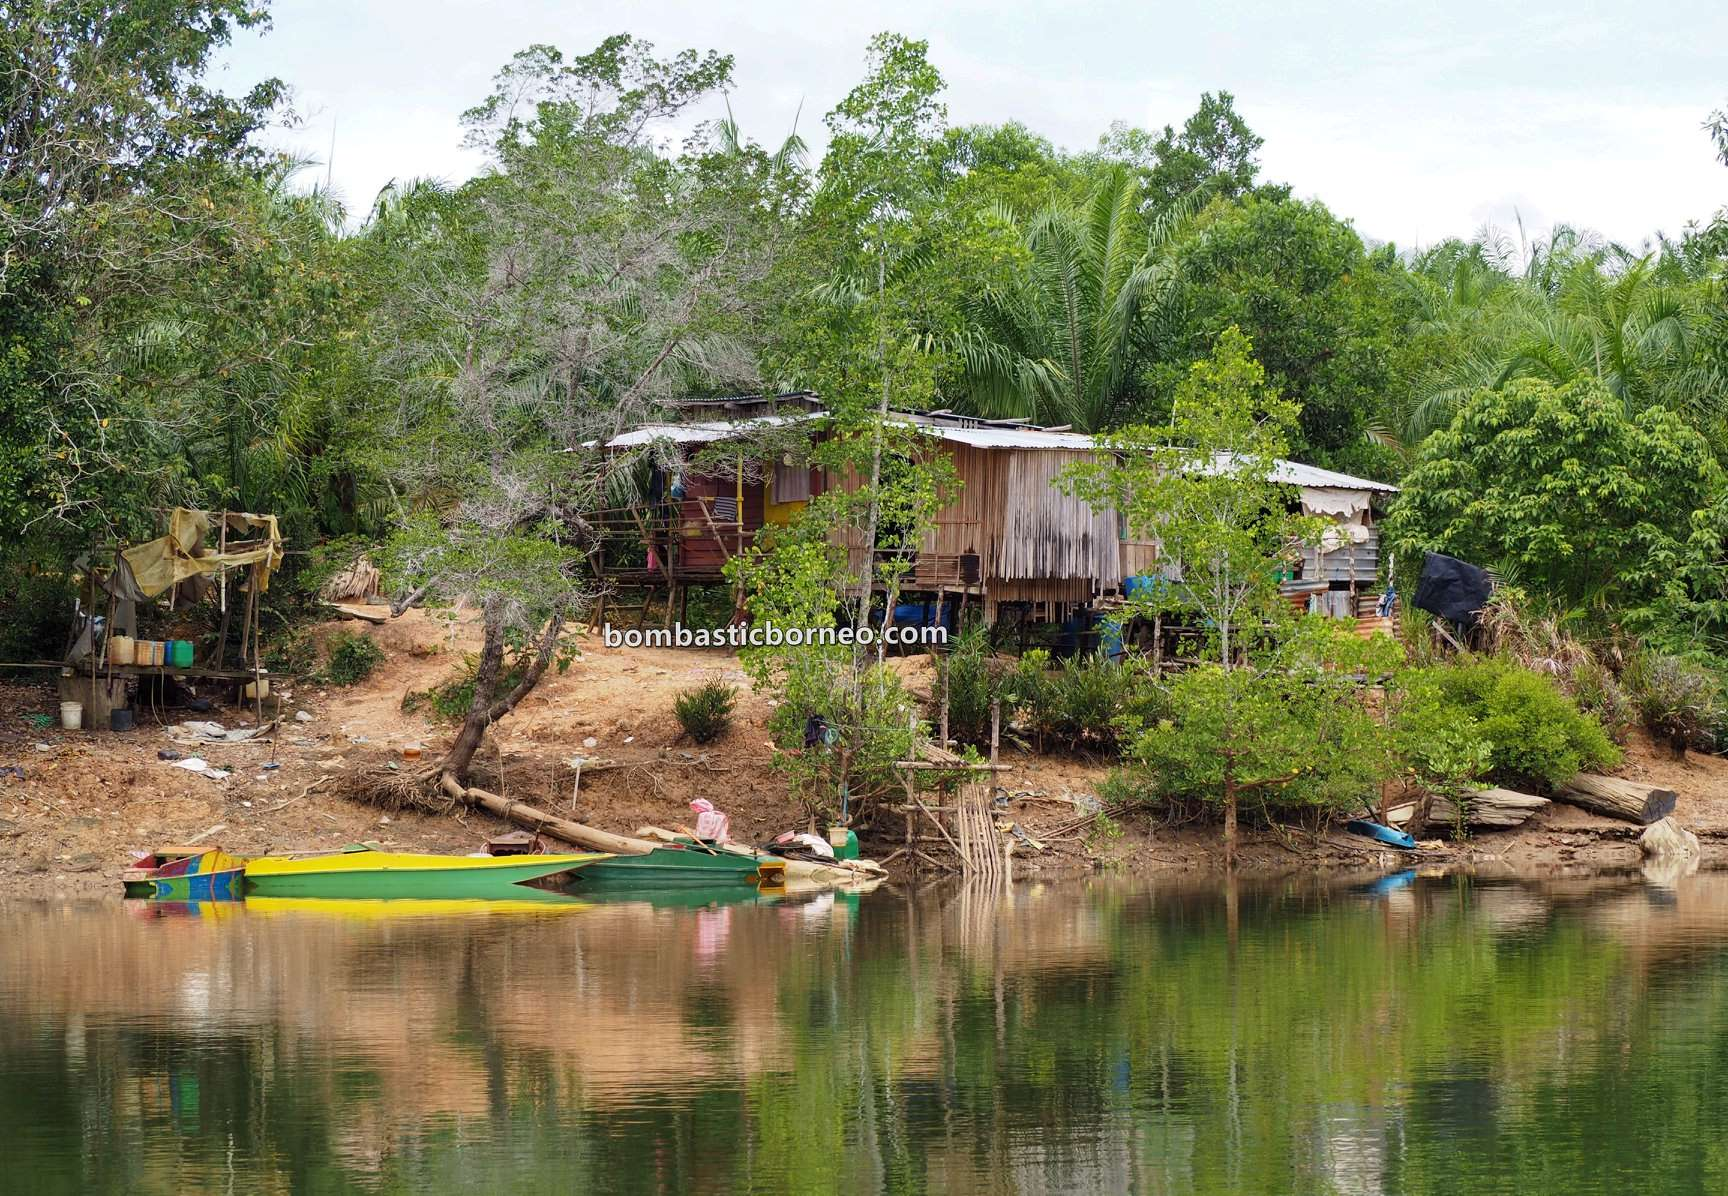 Pulau, boat ride, jelajah, exploration, nature, backpackers, Tawau, Malaysia, tourism, tourist attraction, Travel Guide, 探索婆罗洲游踪, 马来西亚沙巴